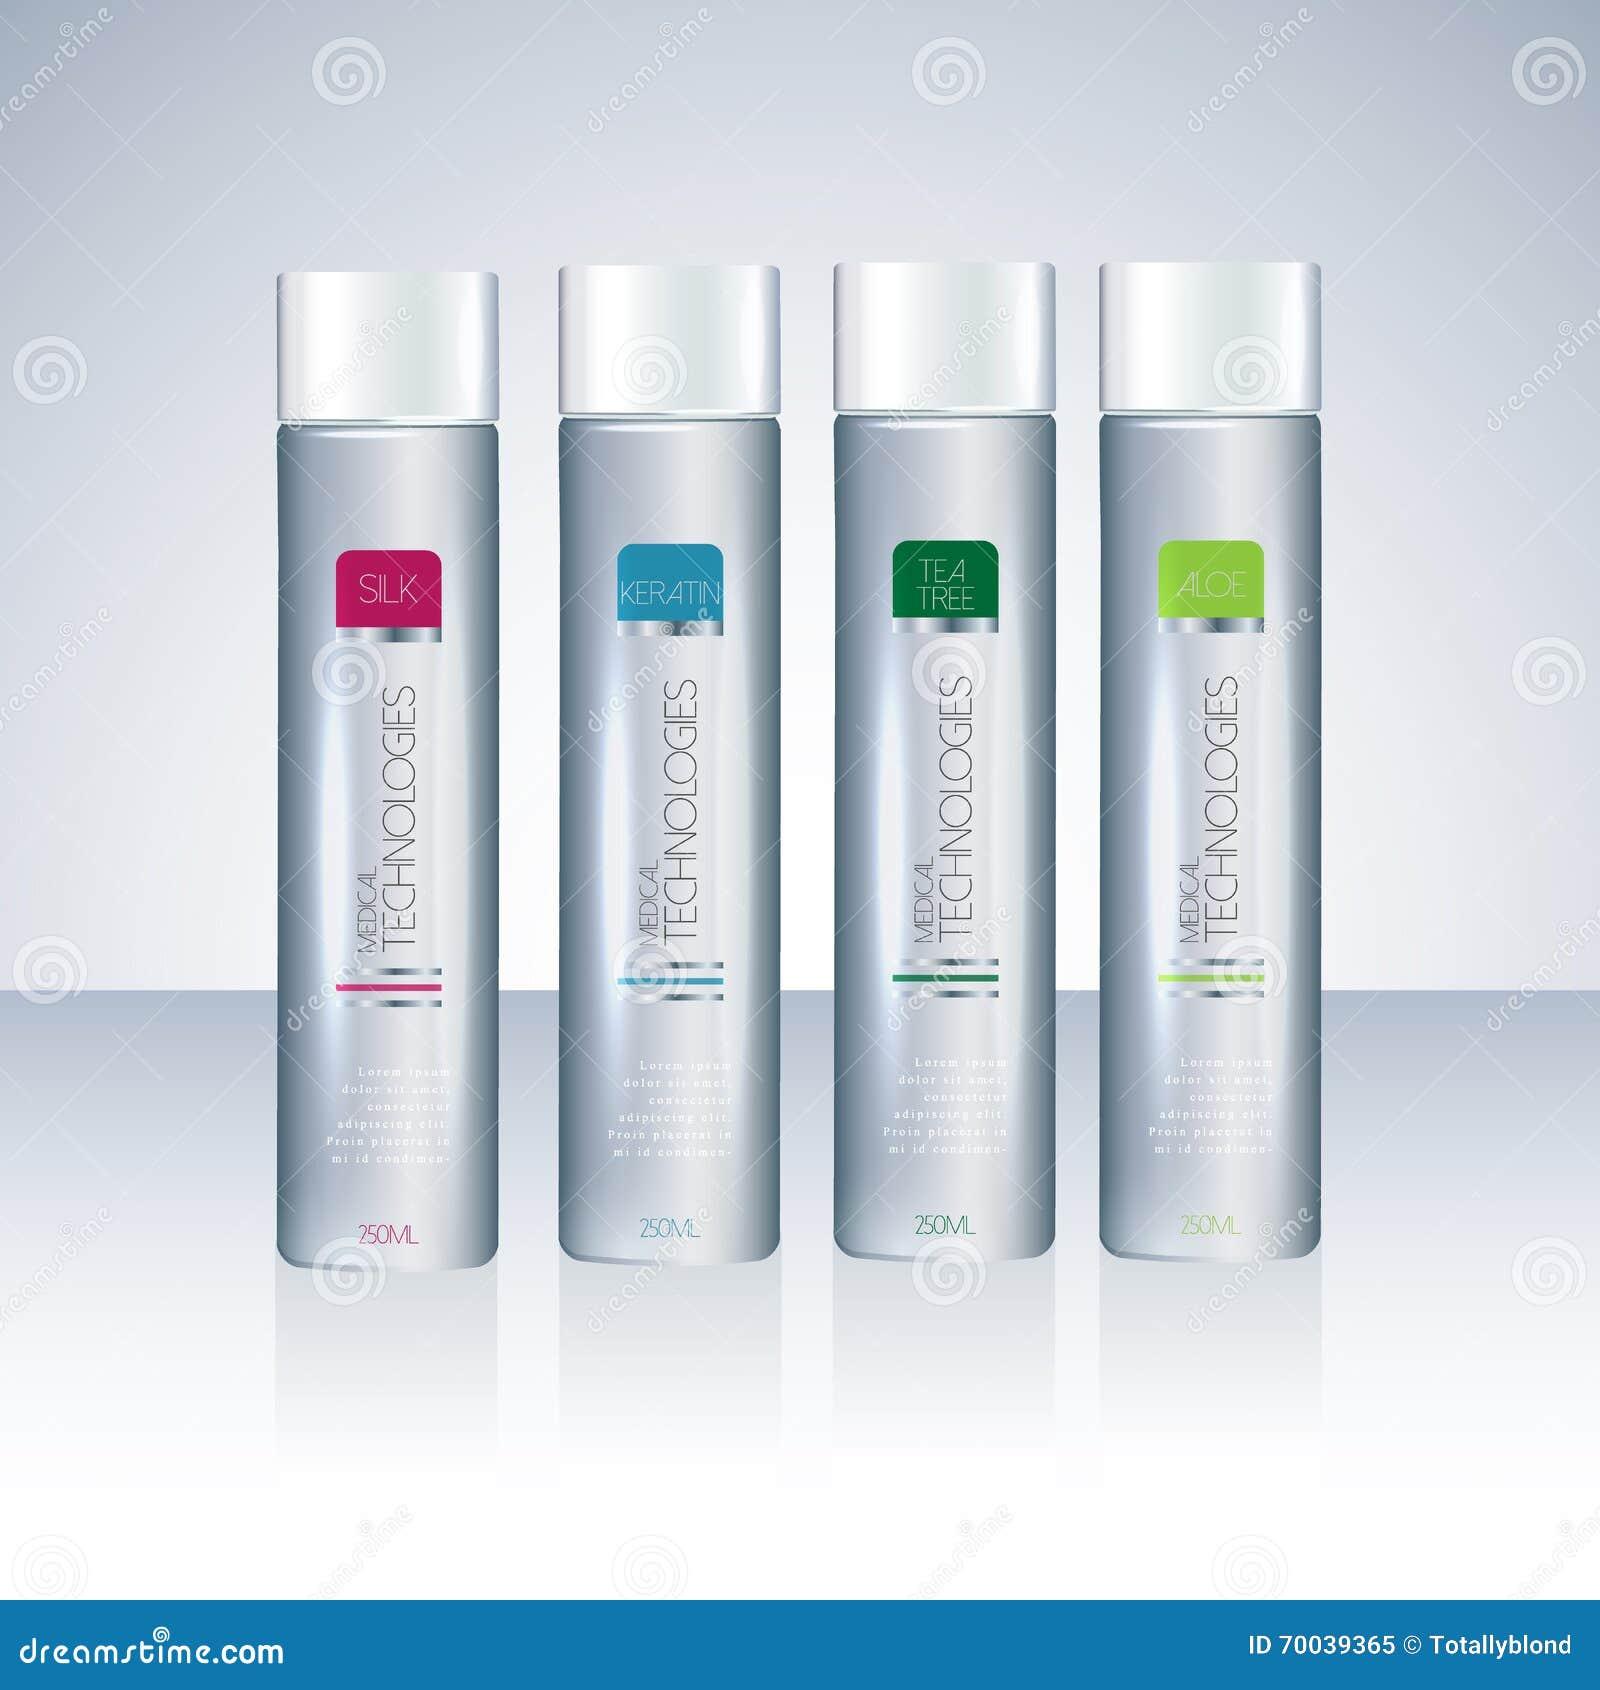 Bottles With Sample Labels For Shower Gel Or Shampoo Stock